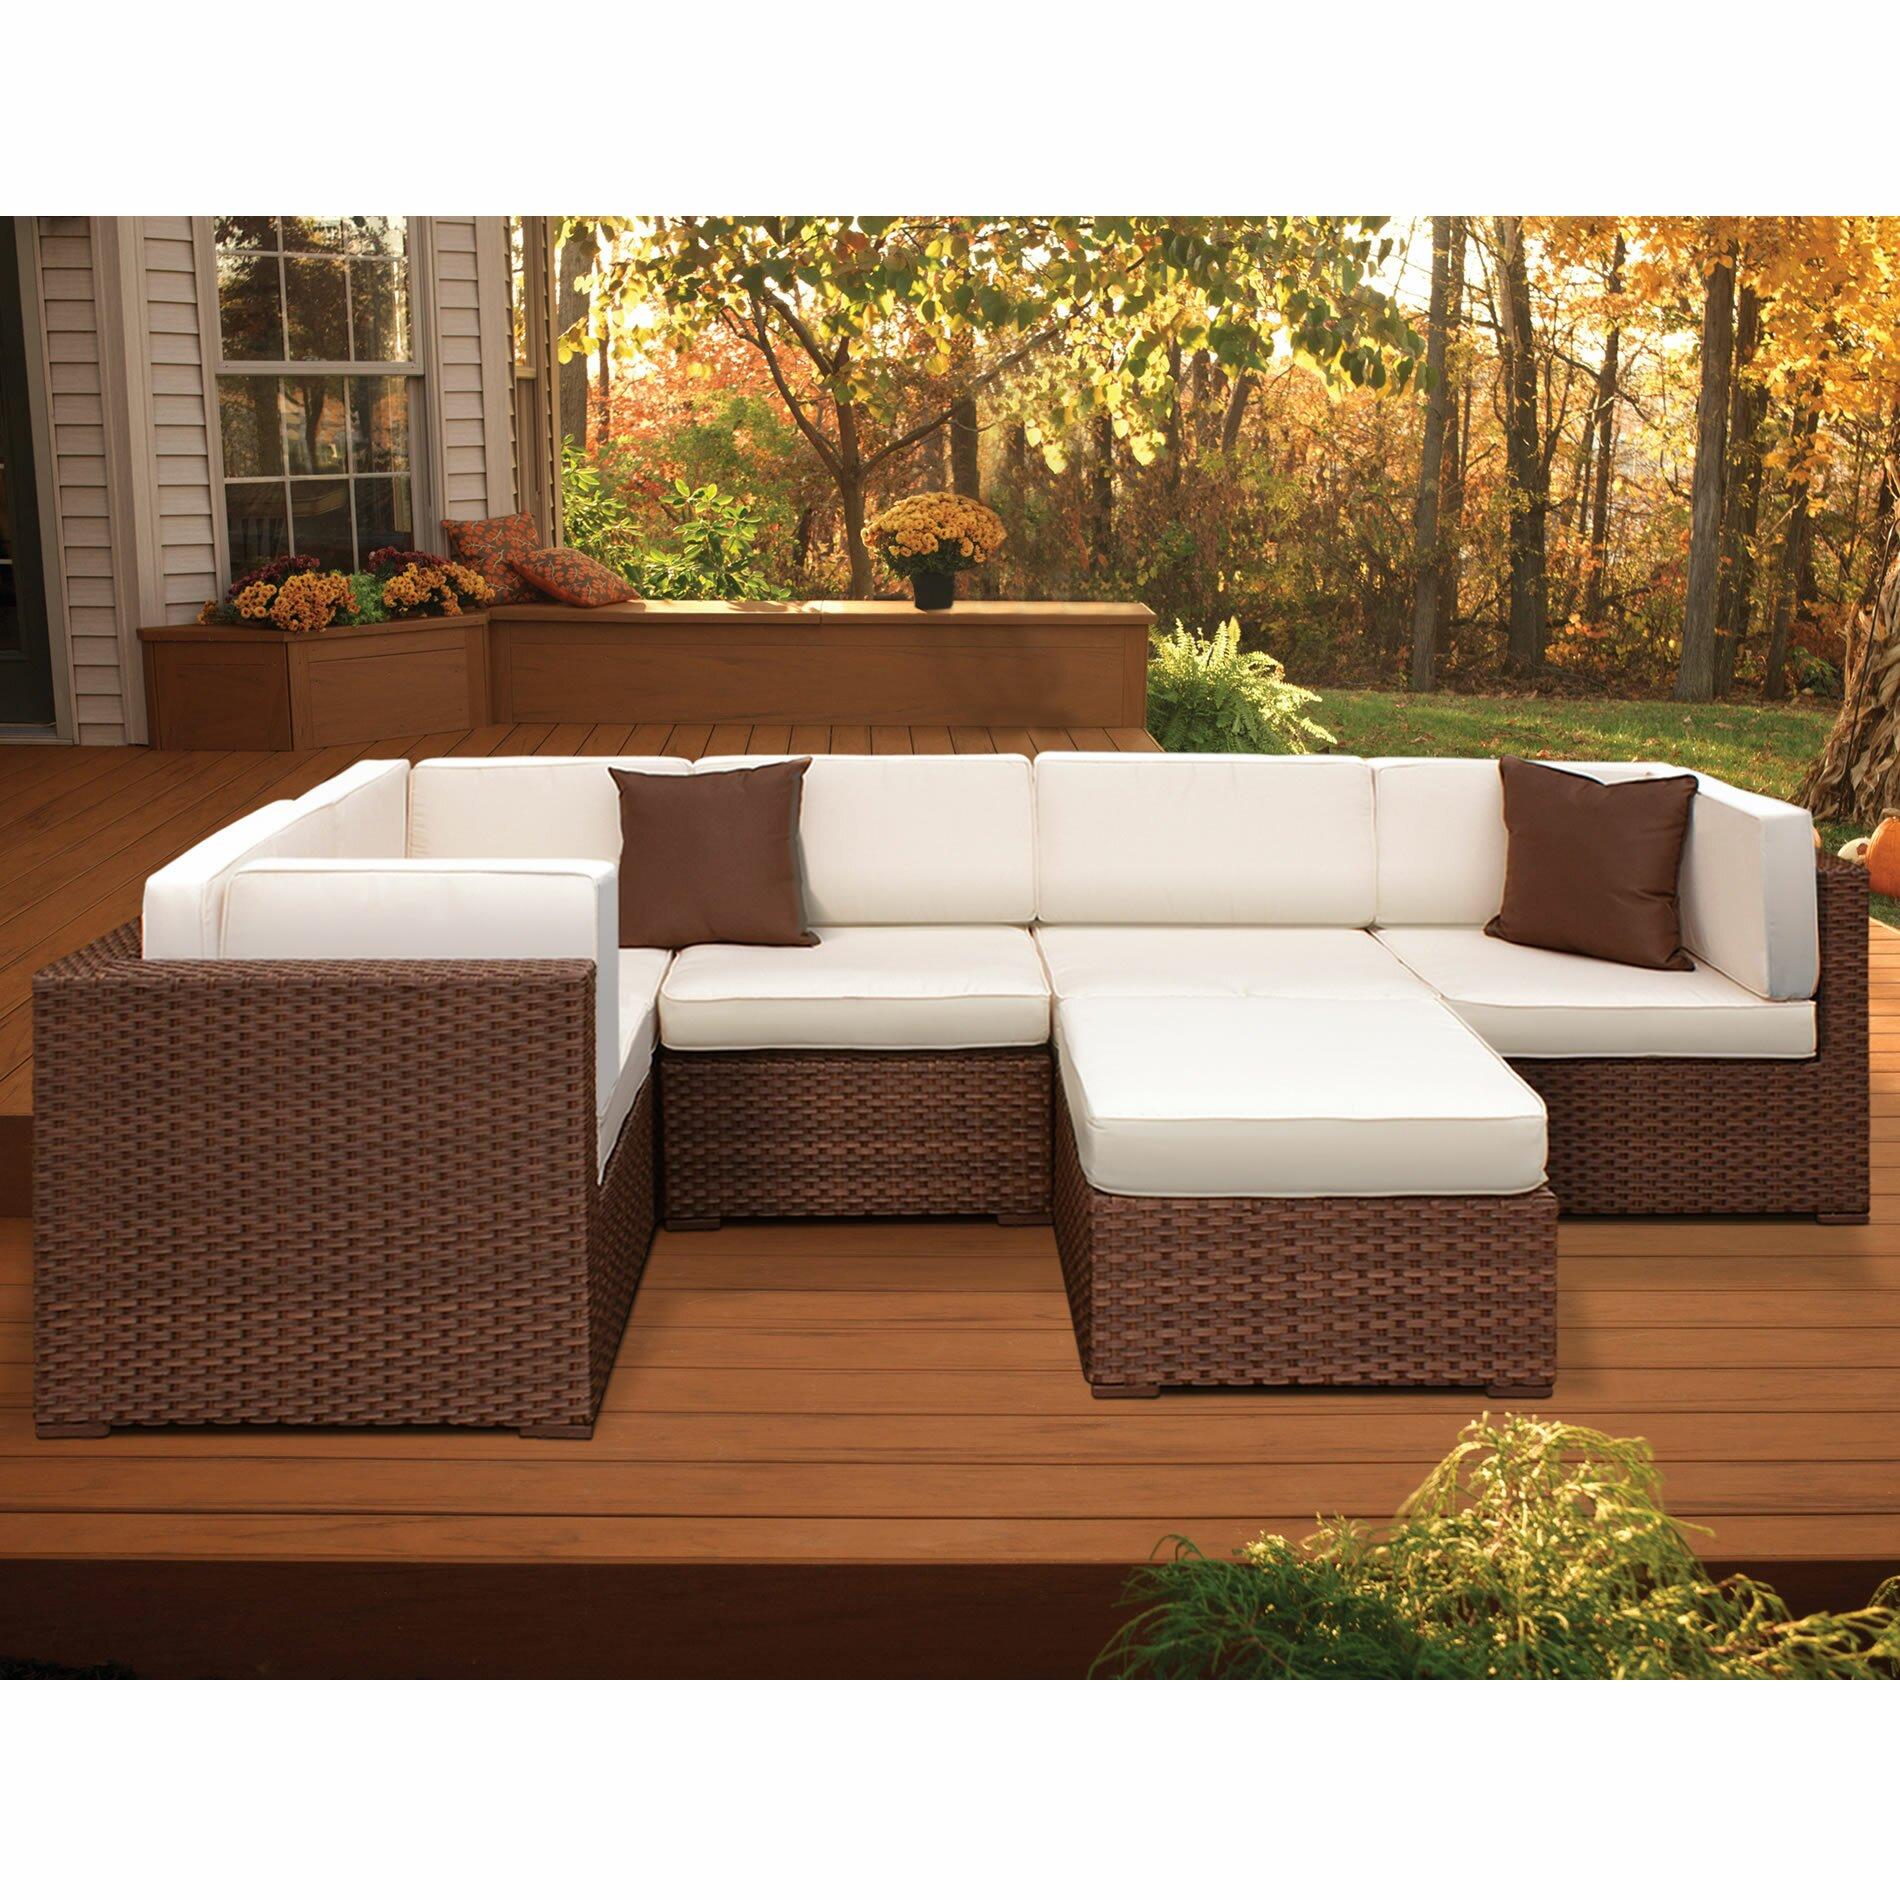 Atlantic Patio Furniture Reviews: International Home Miami Montecarlo Sectional Sofa With